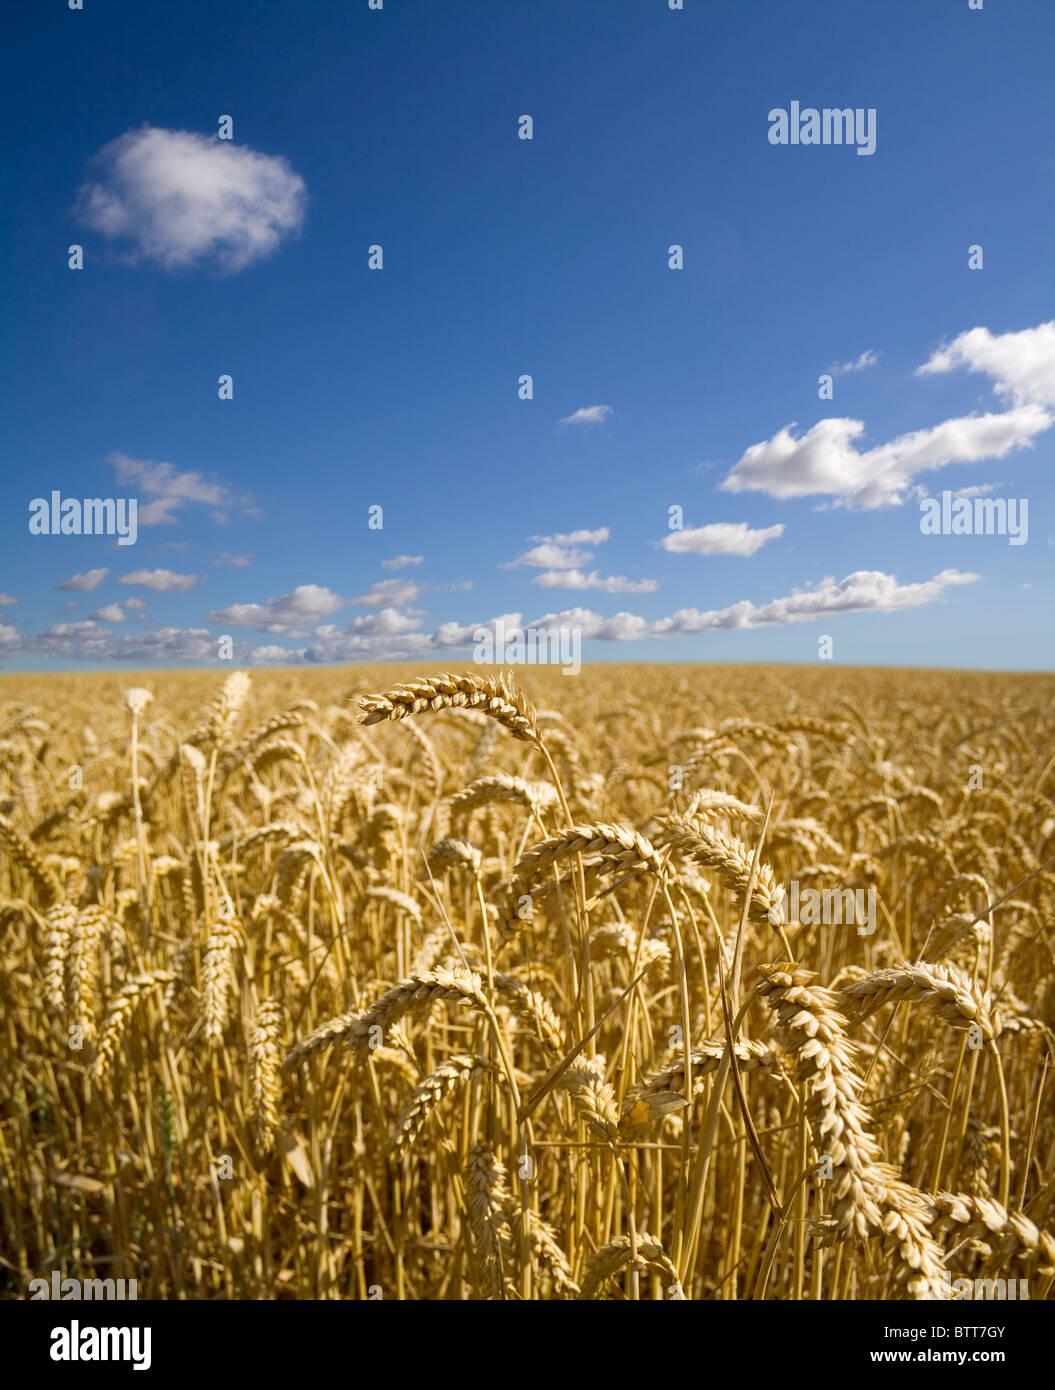 Un campo de trigo de verano de maduración bajo un cielo azul claro. Imagen De Stock